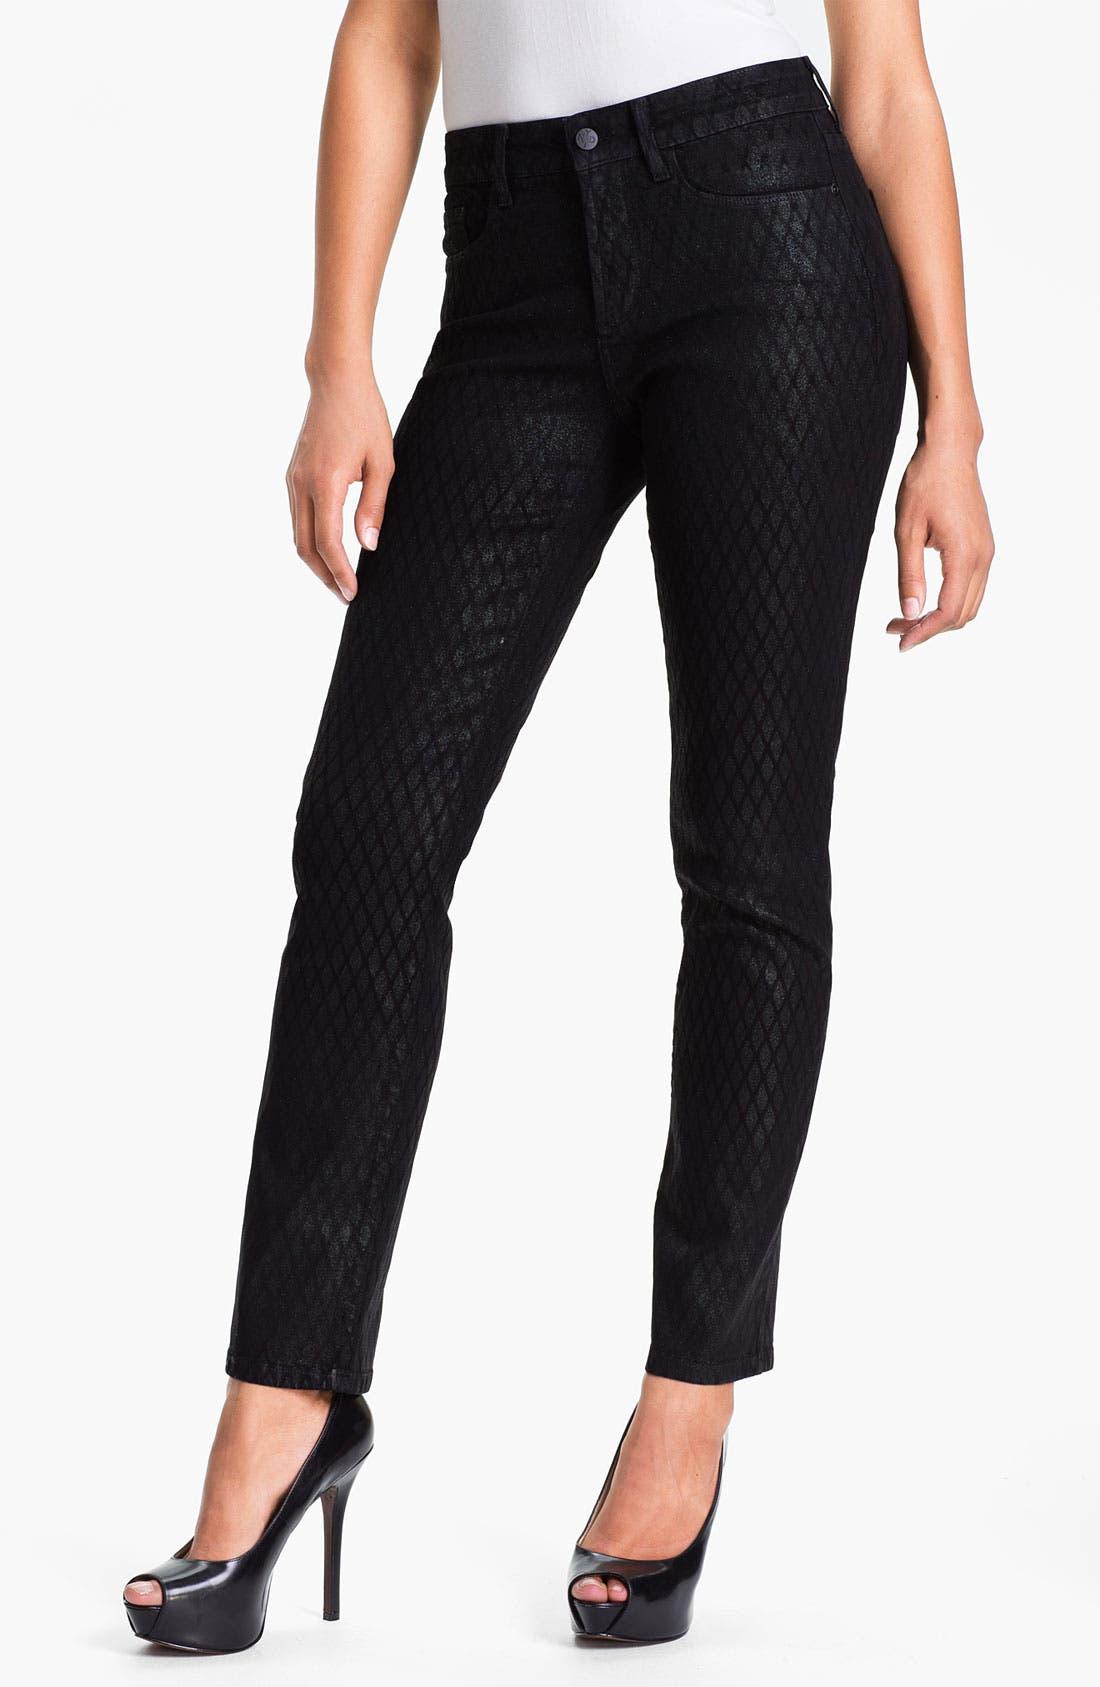 Alternate Image 1 Selected - NYDJ 'Sheri' Print Stretch Skinny Jeans (Petite)